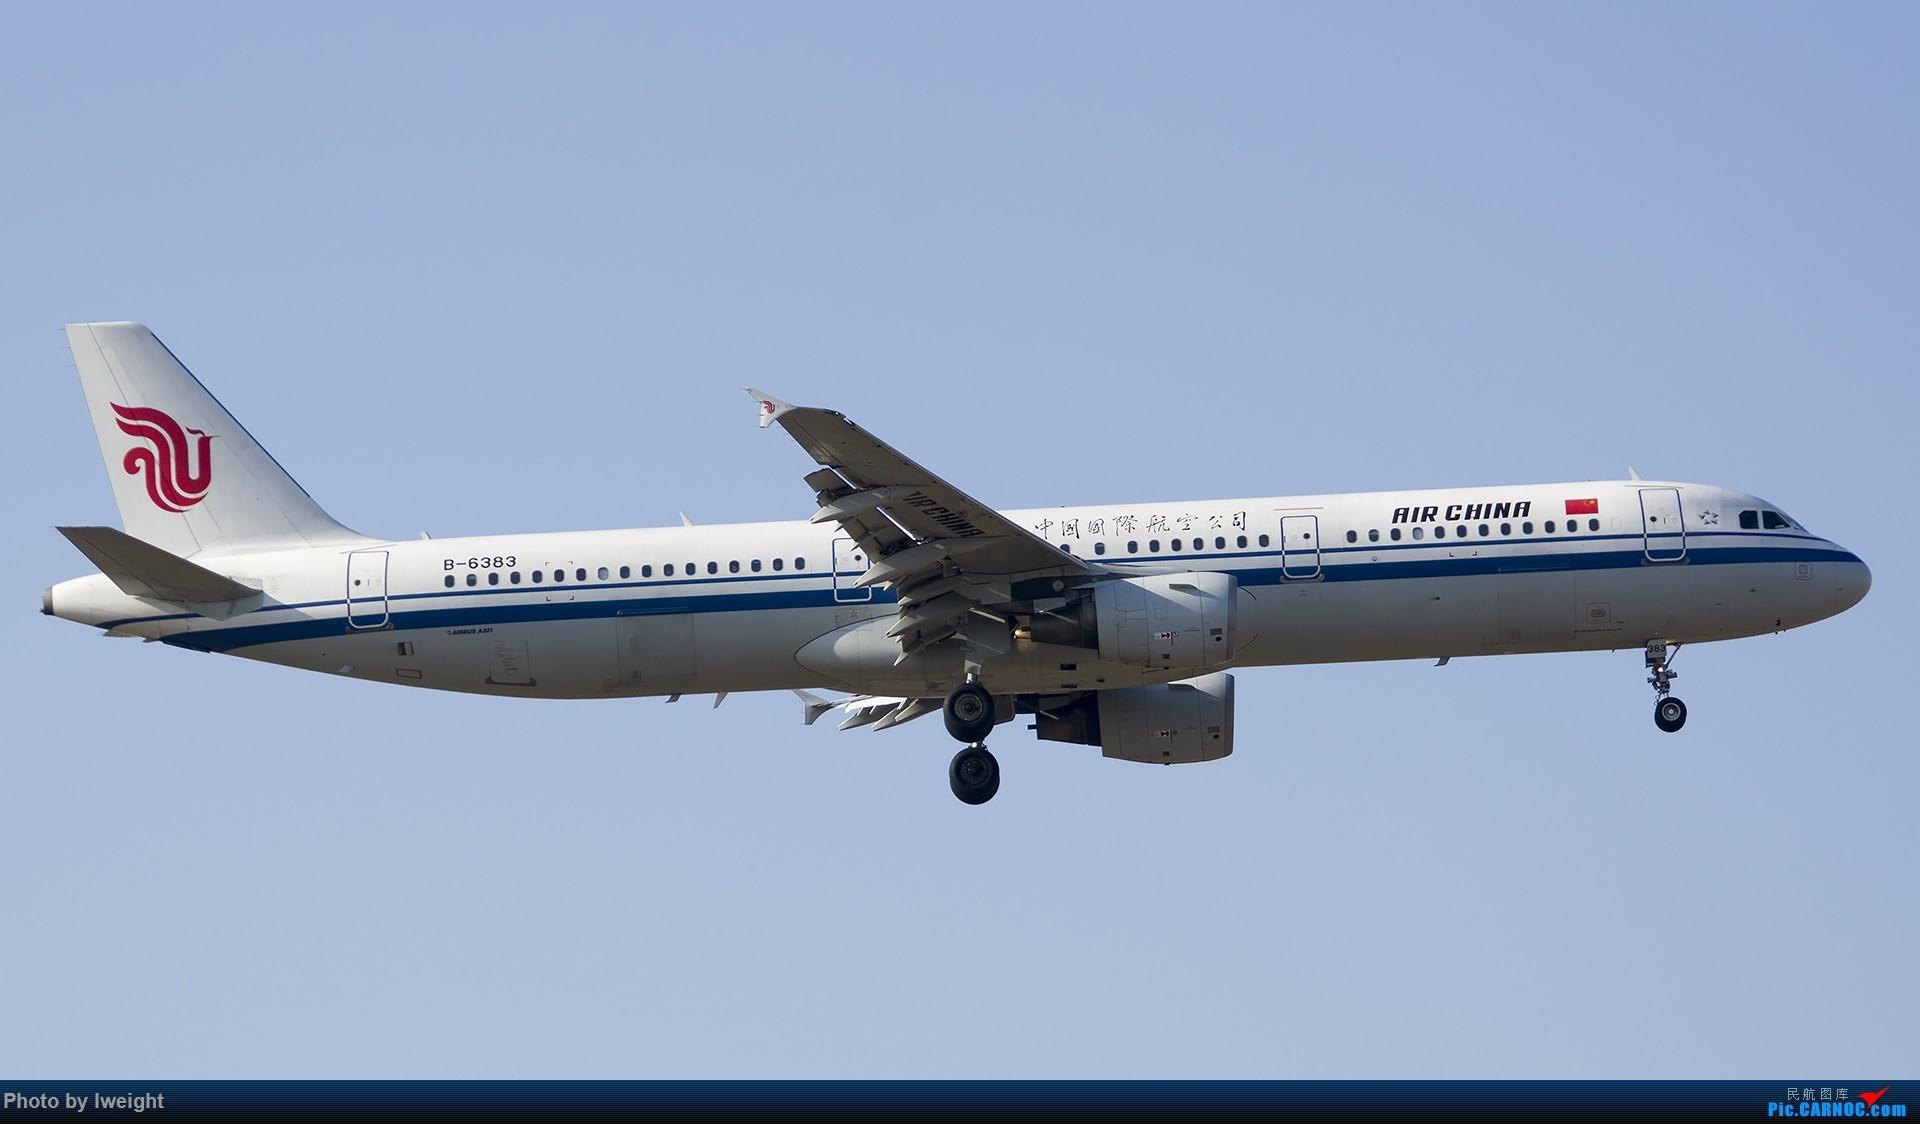 Re:[原创]庆祝升级777,发上今天在首都机场拍的所有飞机【2014-12-14】 AIRBUS A321-200 B-6383 中国北京首都国际机场